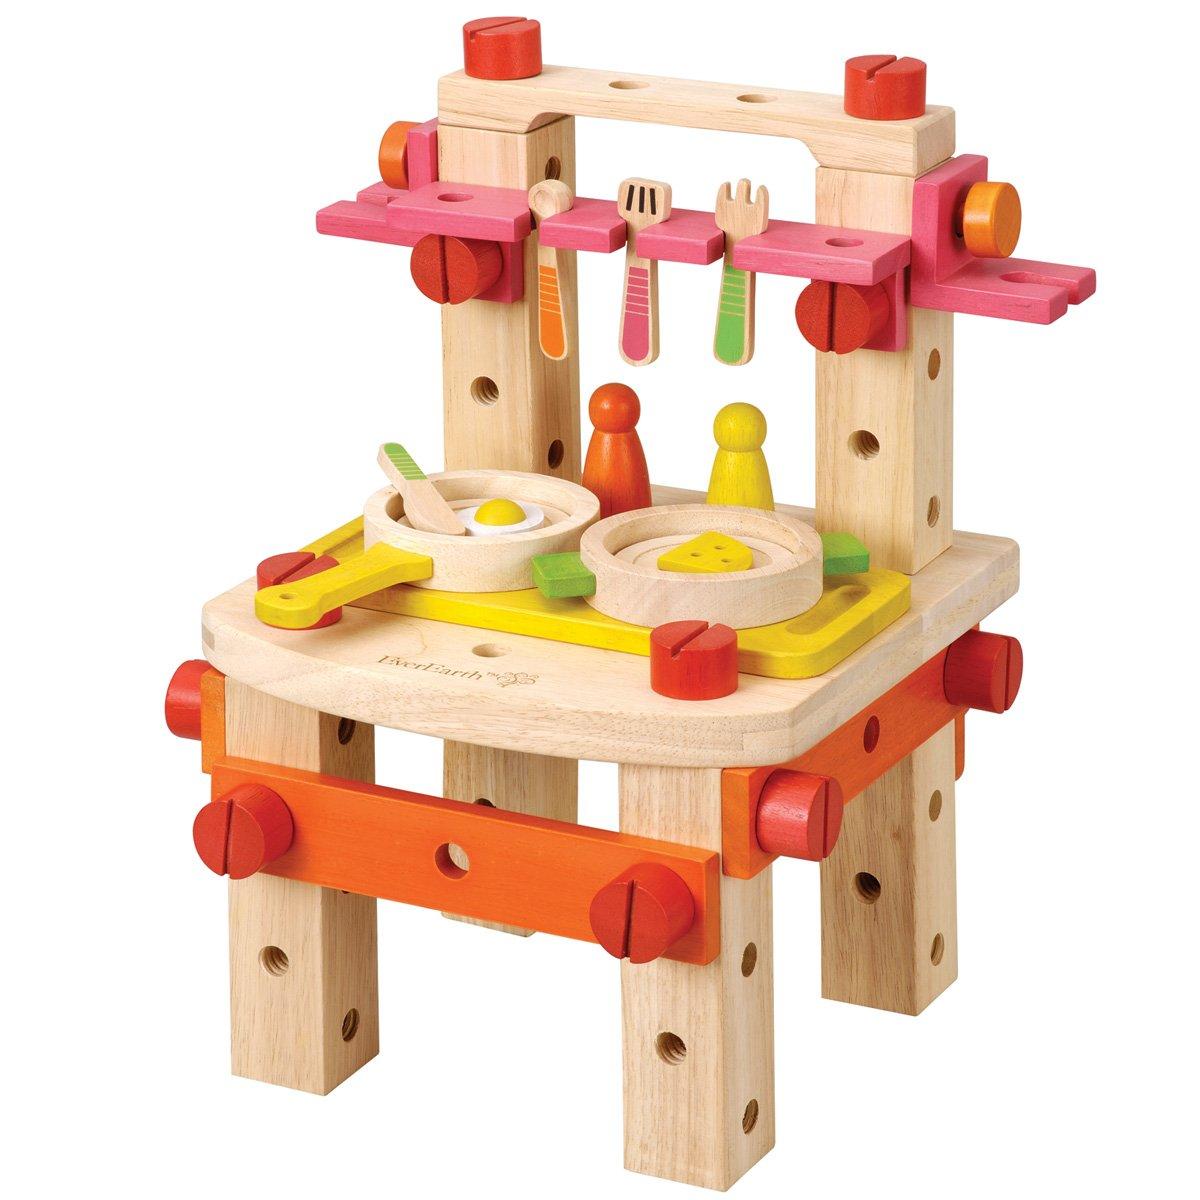 Amazon.com: EverEarth Work Kitchen Set: Toys & Games